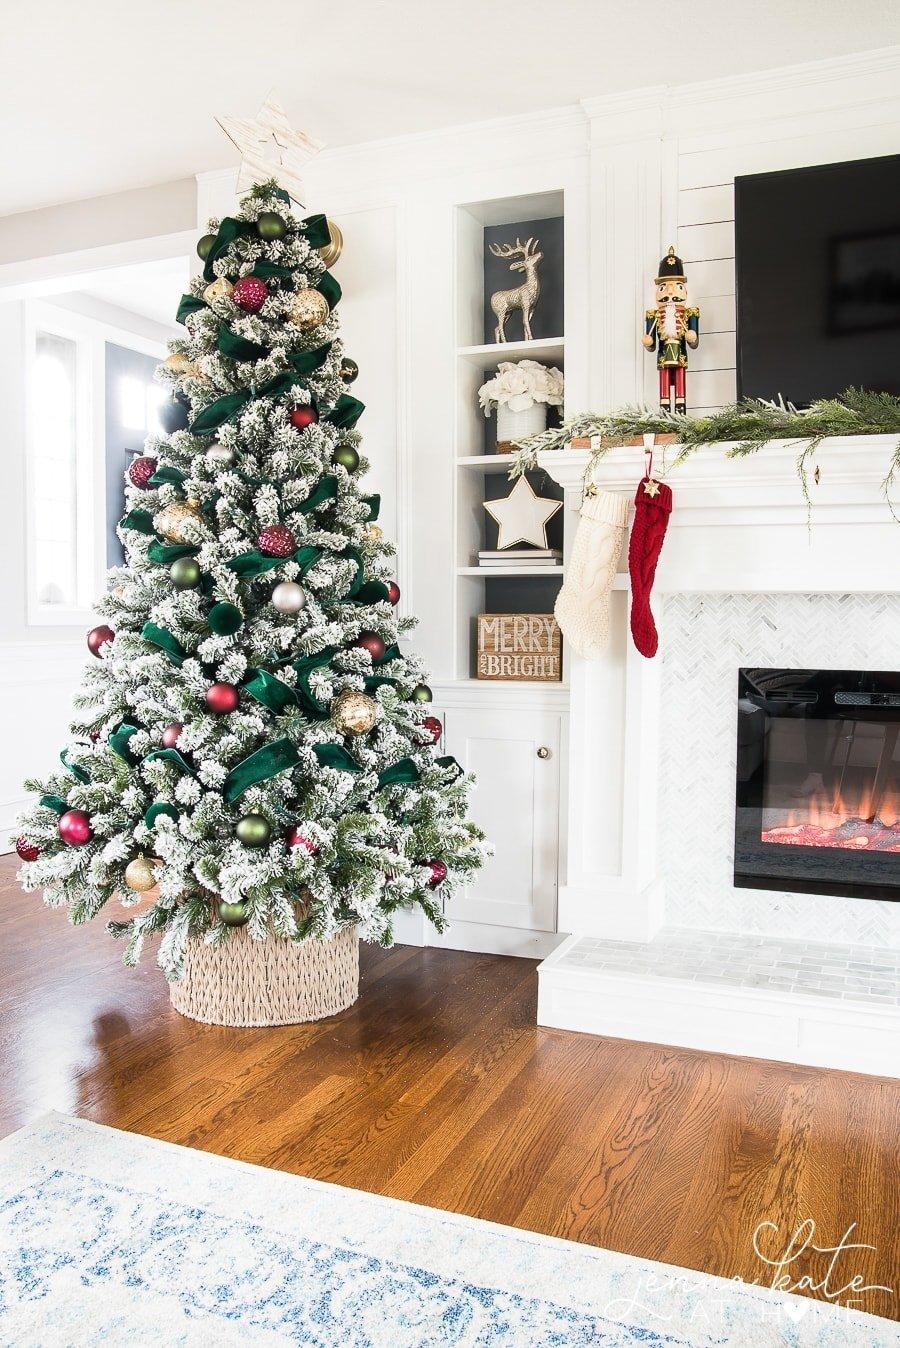 Easy and Elegant Christmas Decor - Jenna Kate at Home